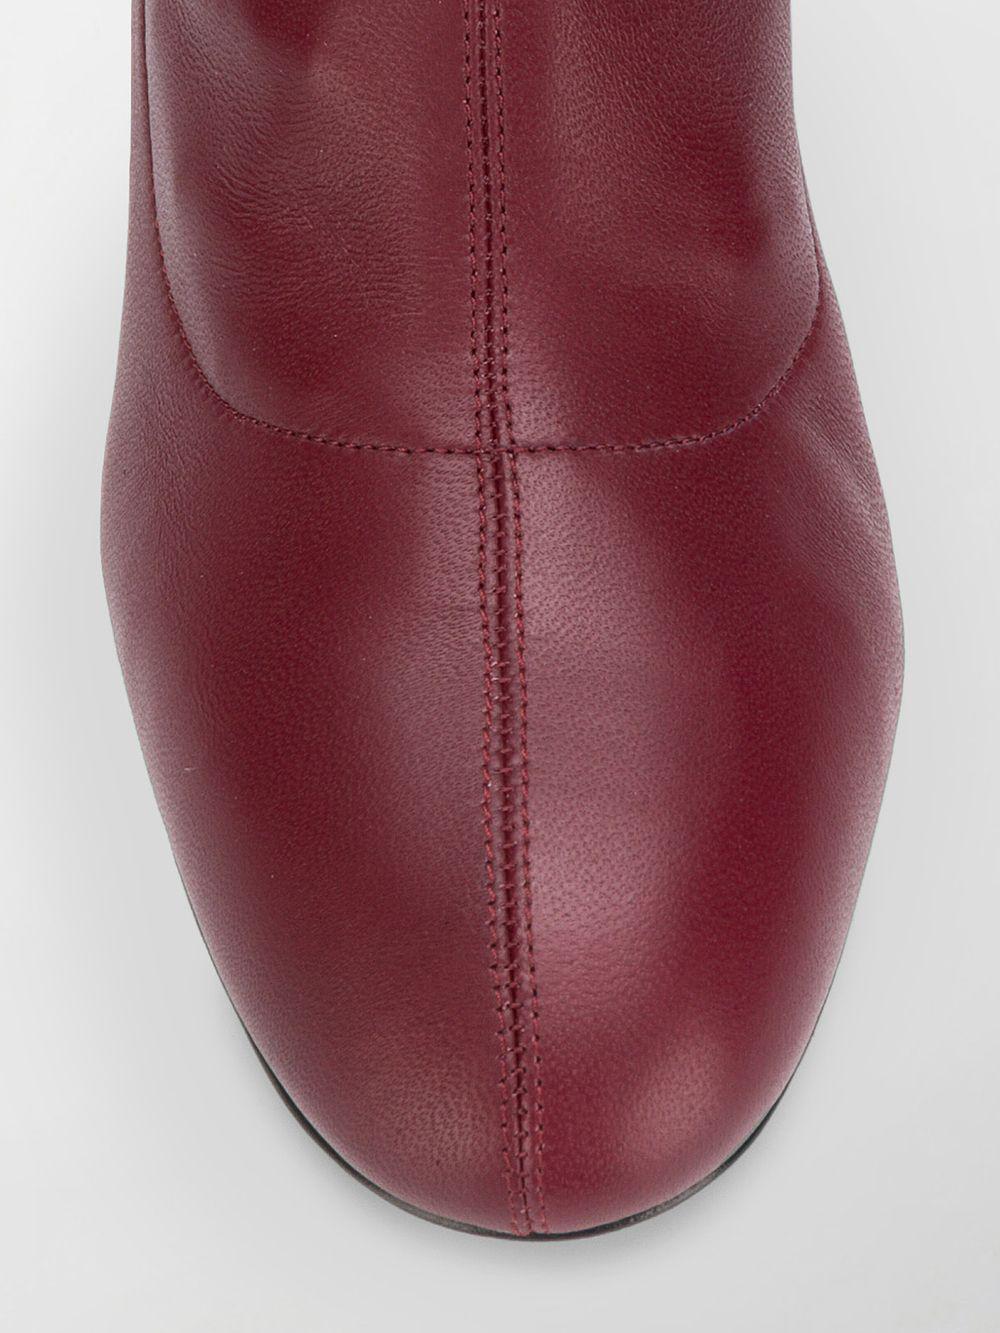 Alexander McQueen Over-the-knee Boots in Red